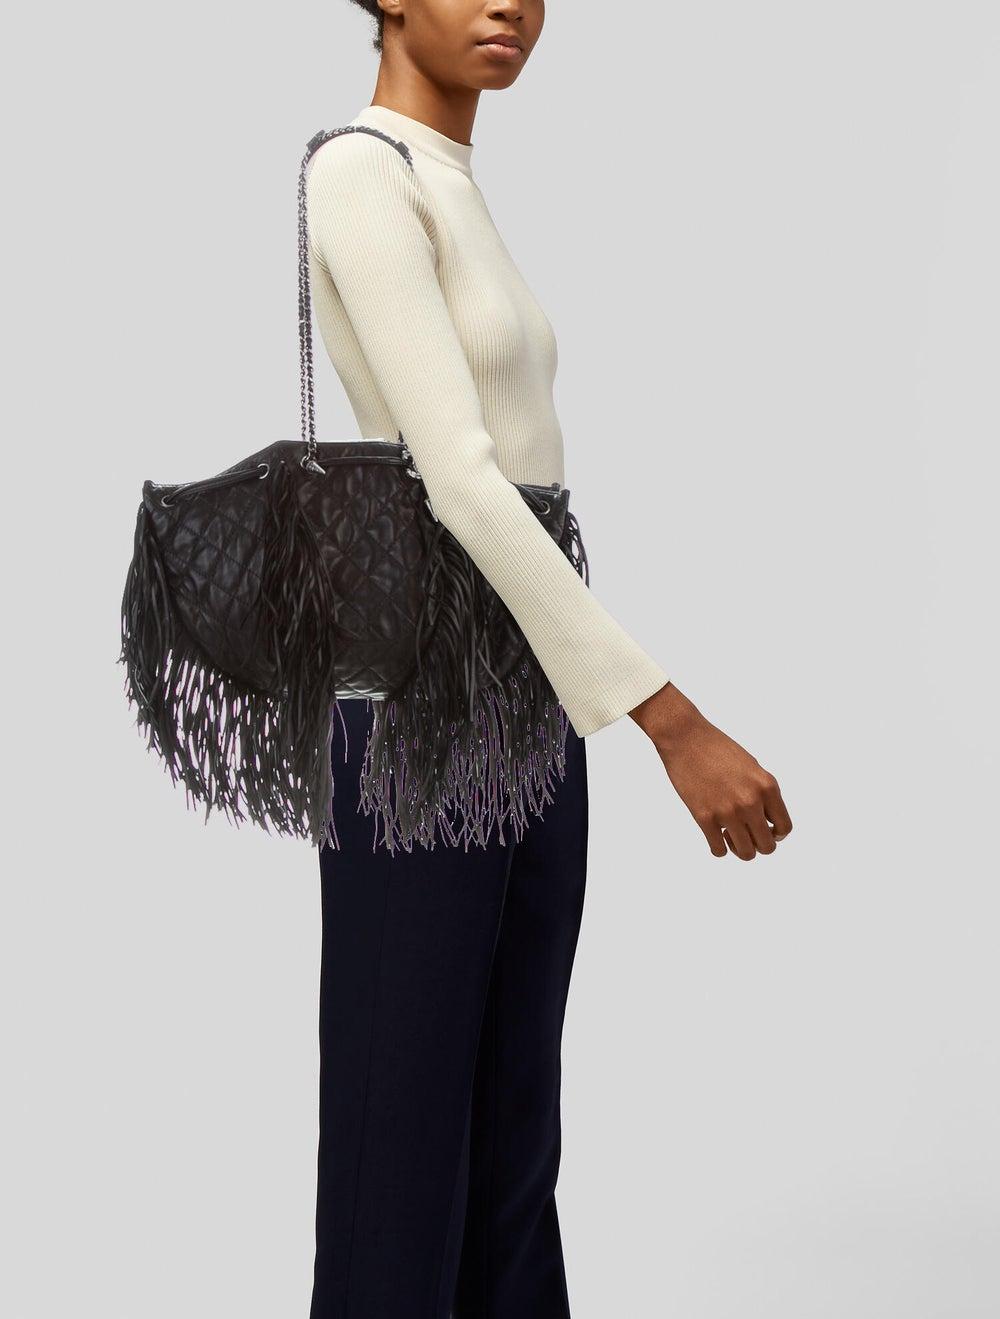 Chanel Western Baluchon Fringe Bag Black - image 2